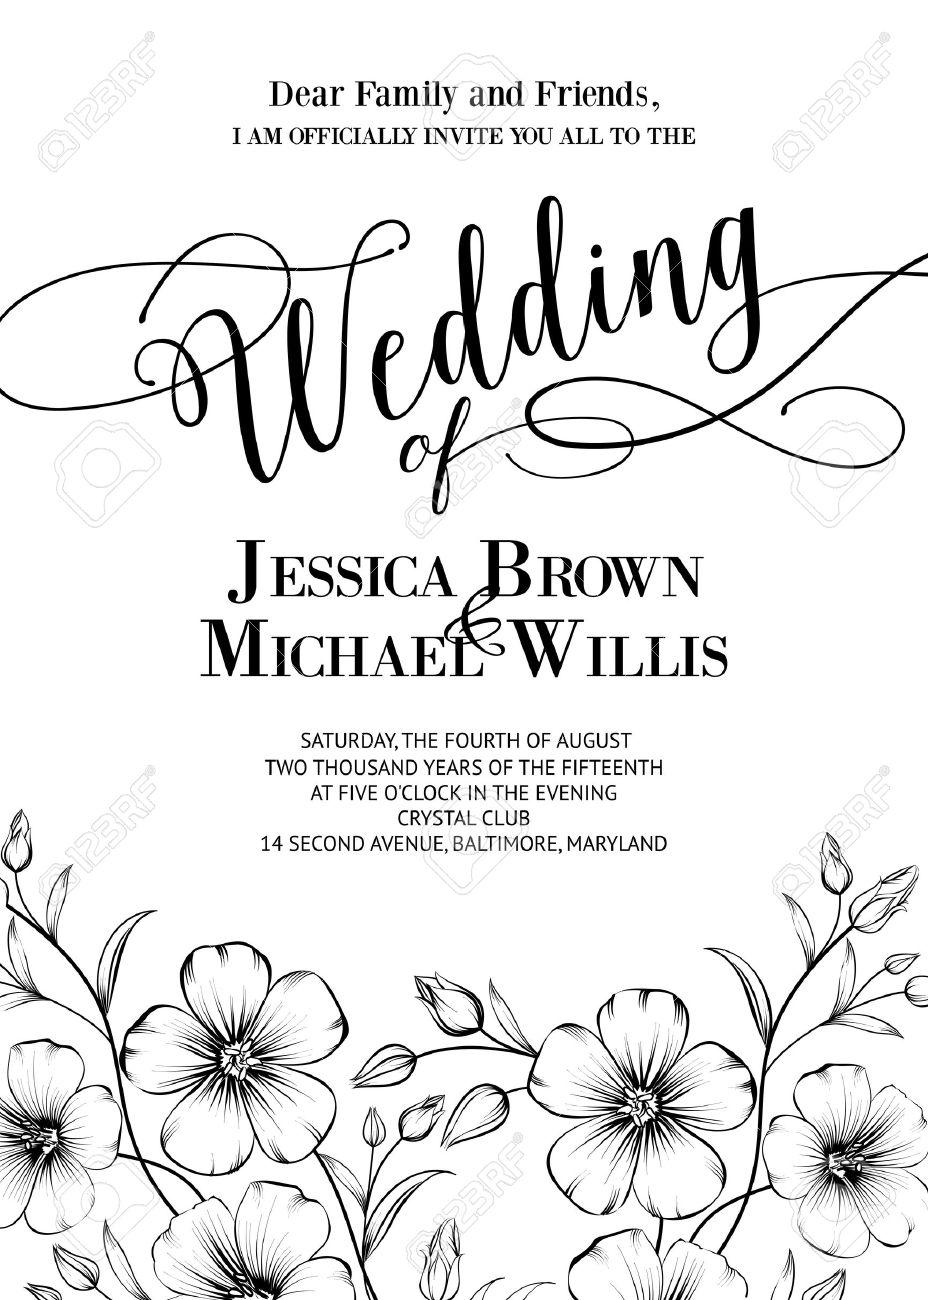 Awesome wedding invitation with generic text for your design awesome wedding invitation with generic text for your design isolated over white vector illustration stopboris Choice Image